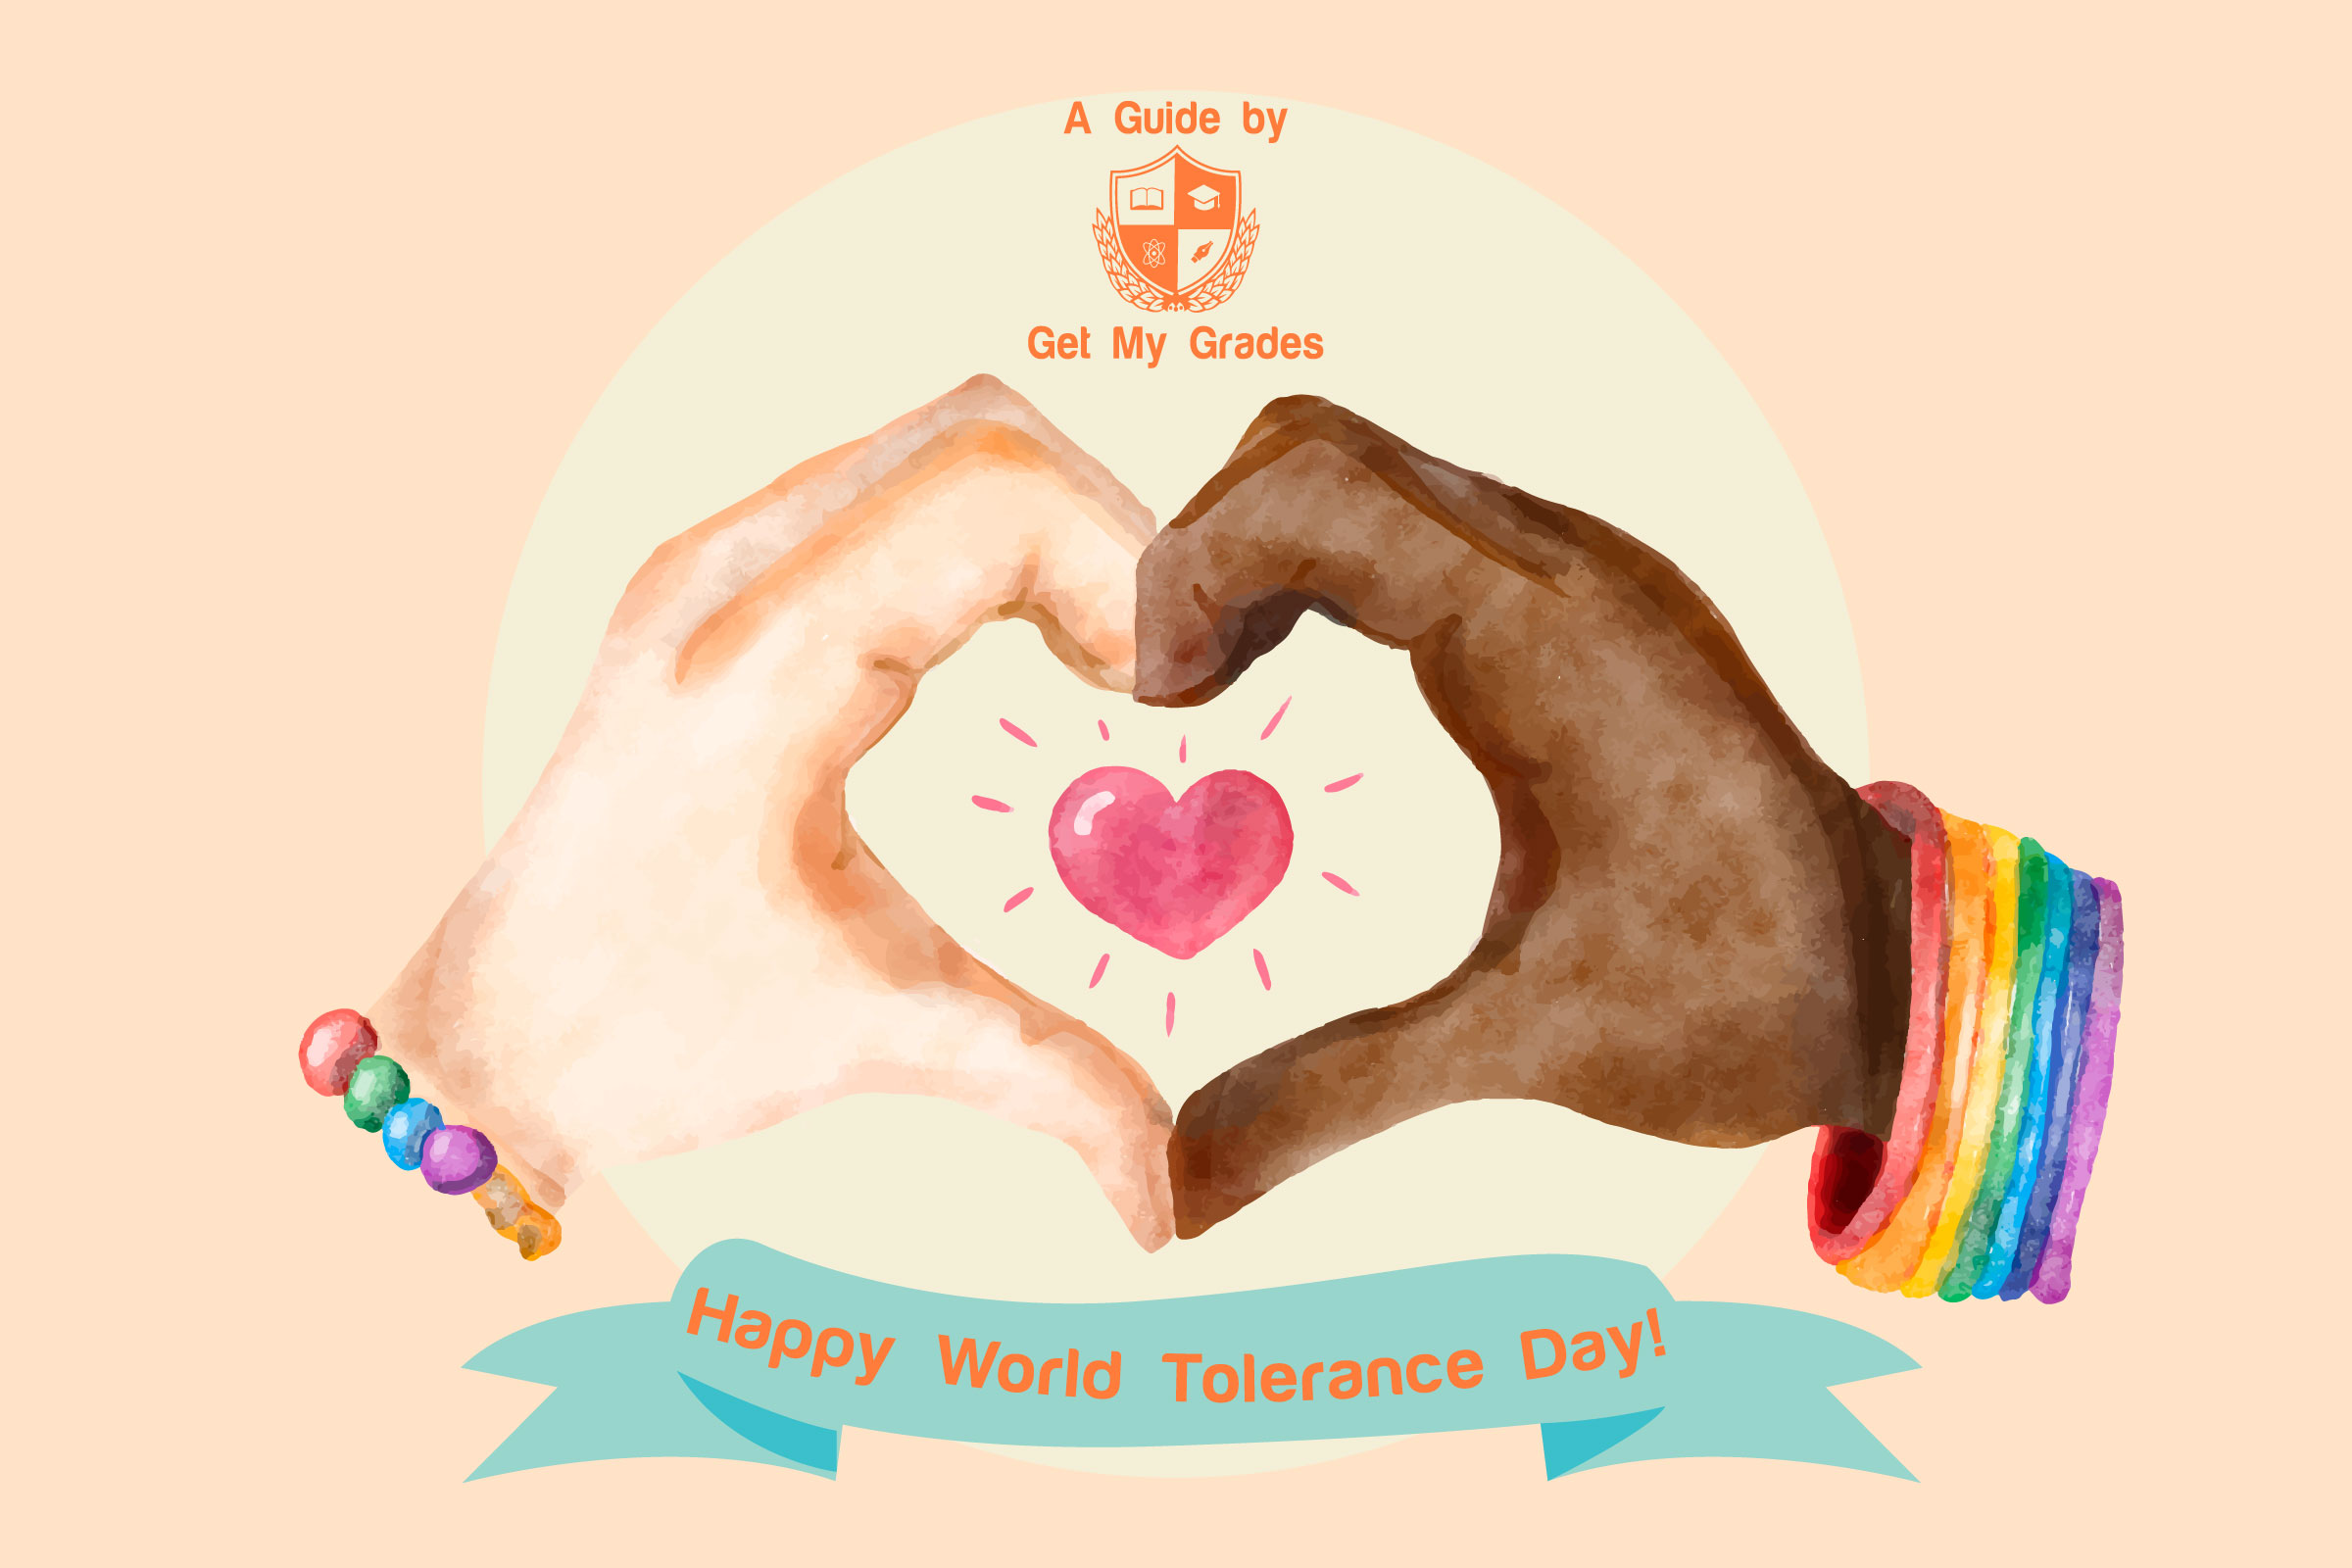 Anti-Bullying Week 2017: International Day of Tolerance